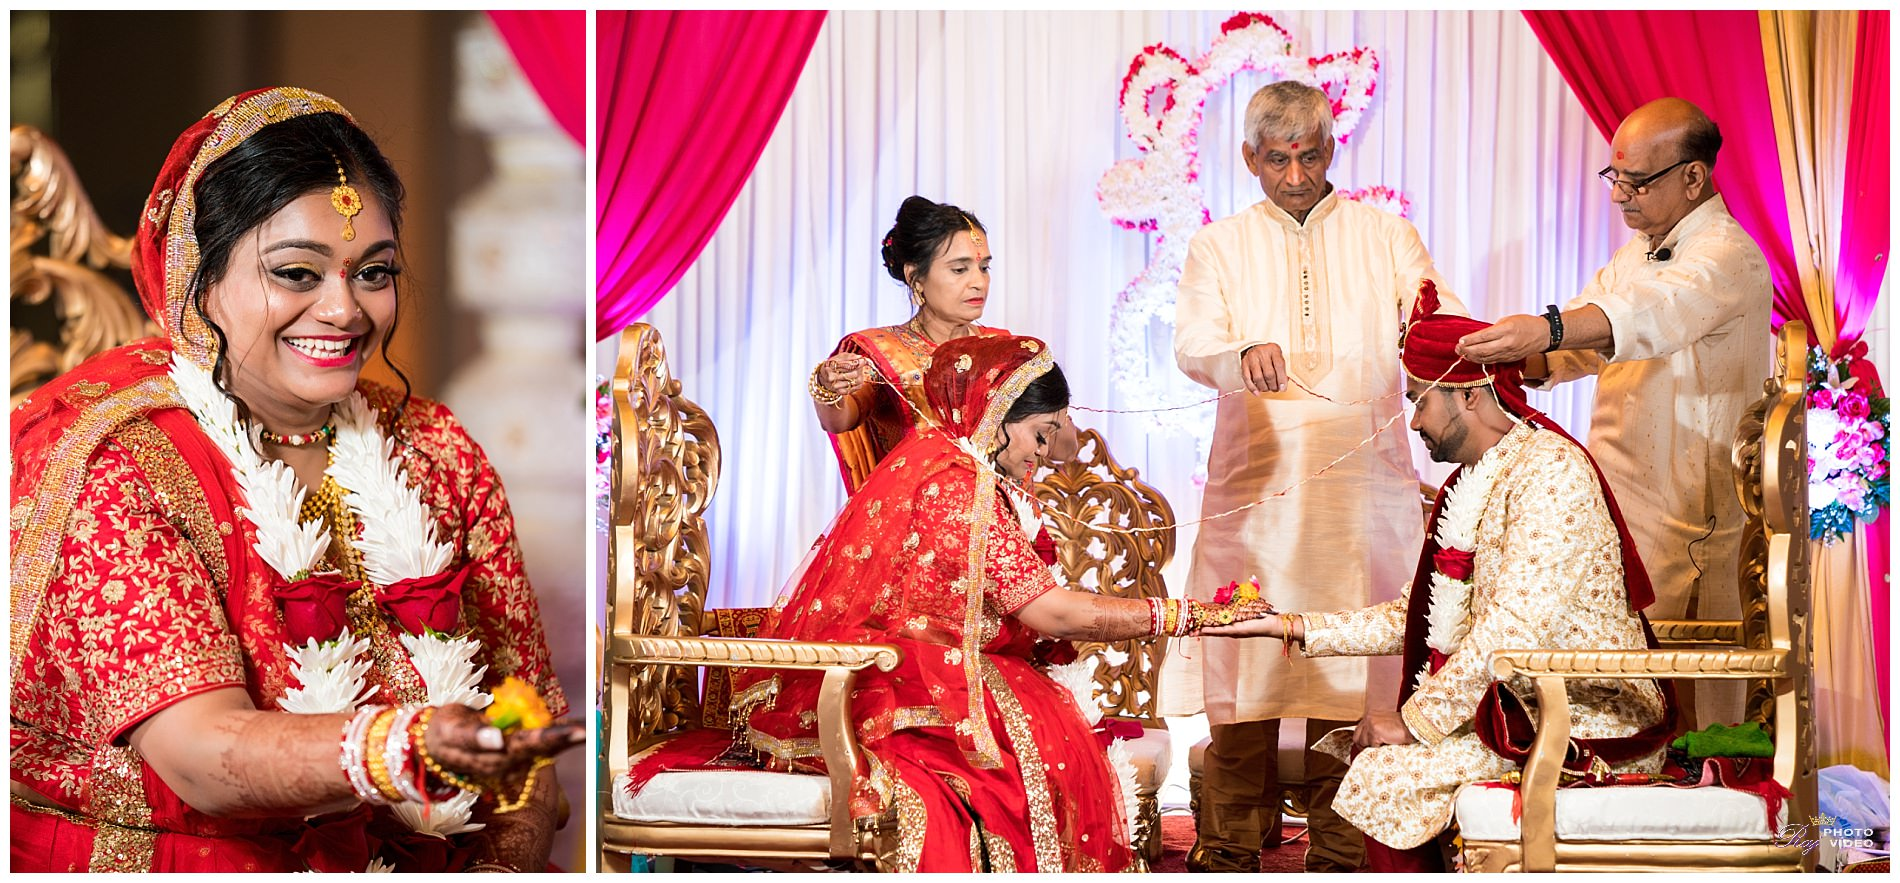 doubletree-by-hilton-hotel-wilmington-de-wedding-krishna-ritesh-58.jpg